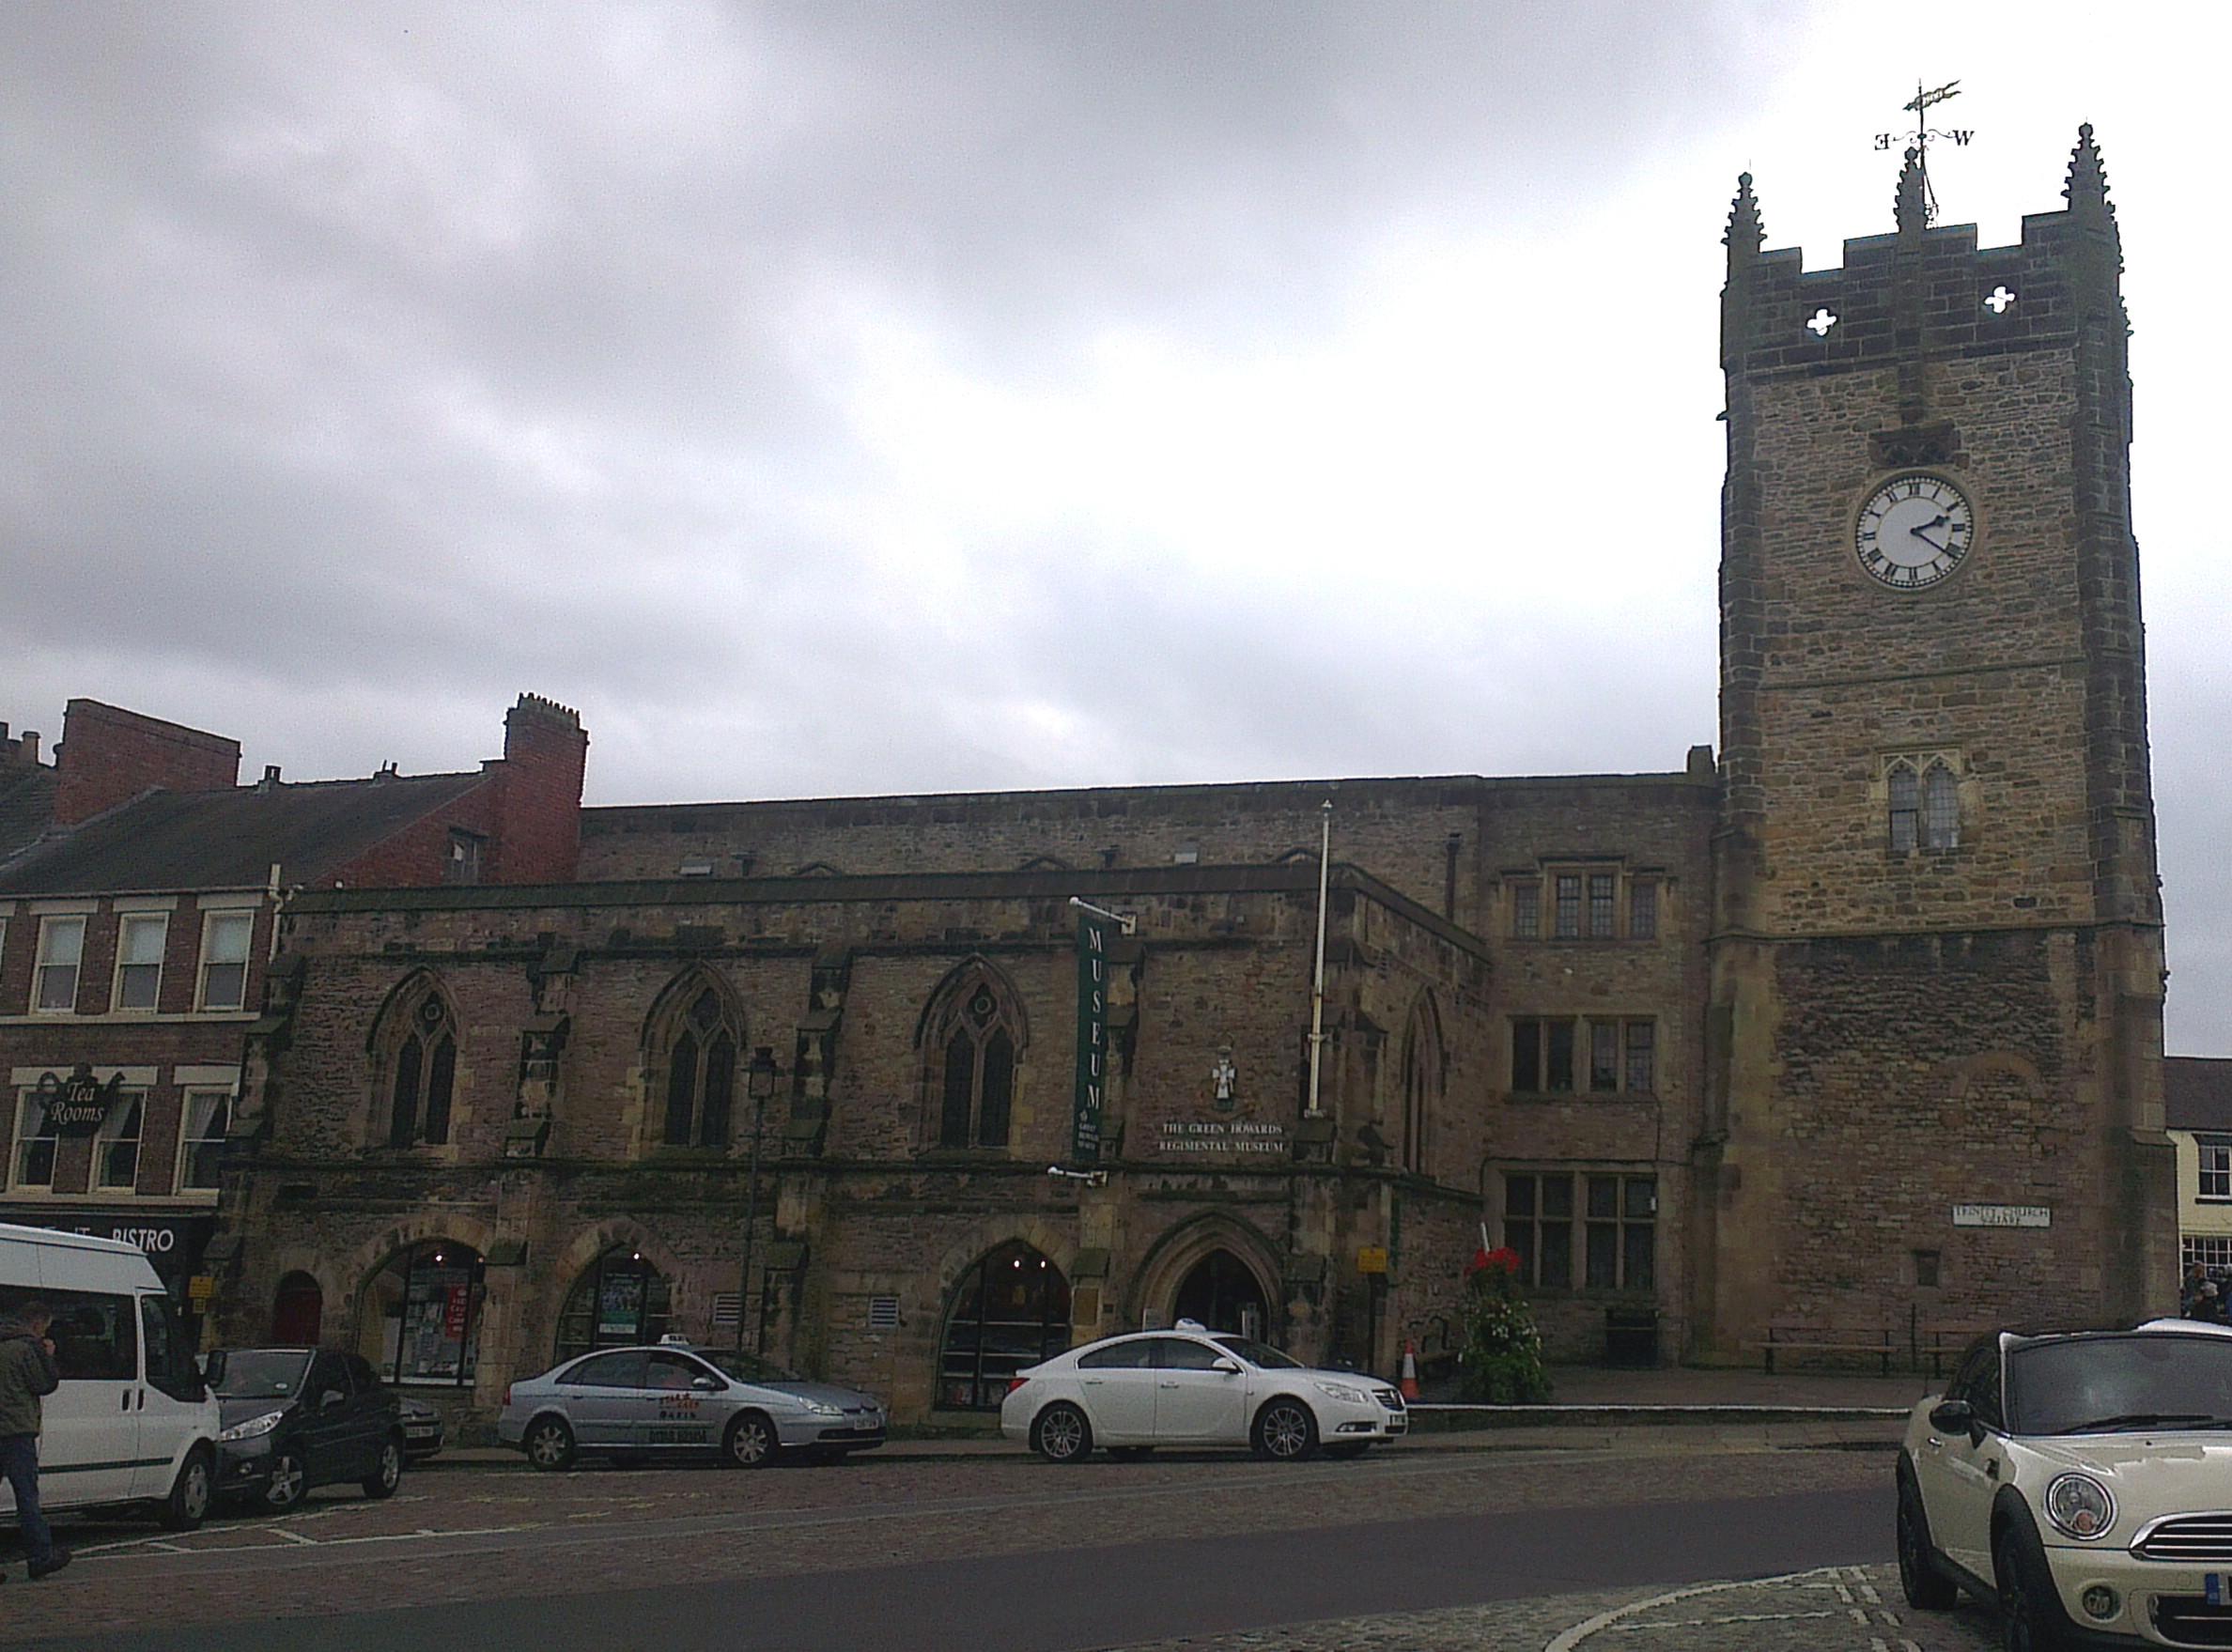 The Green Howards Regimental Museum